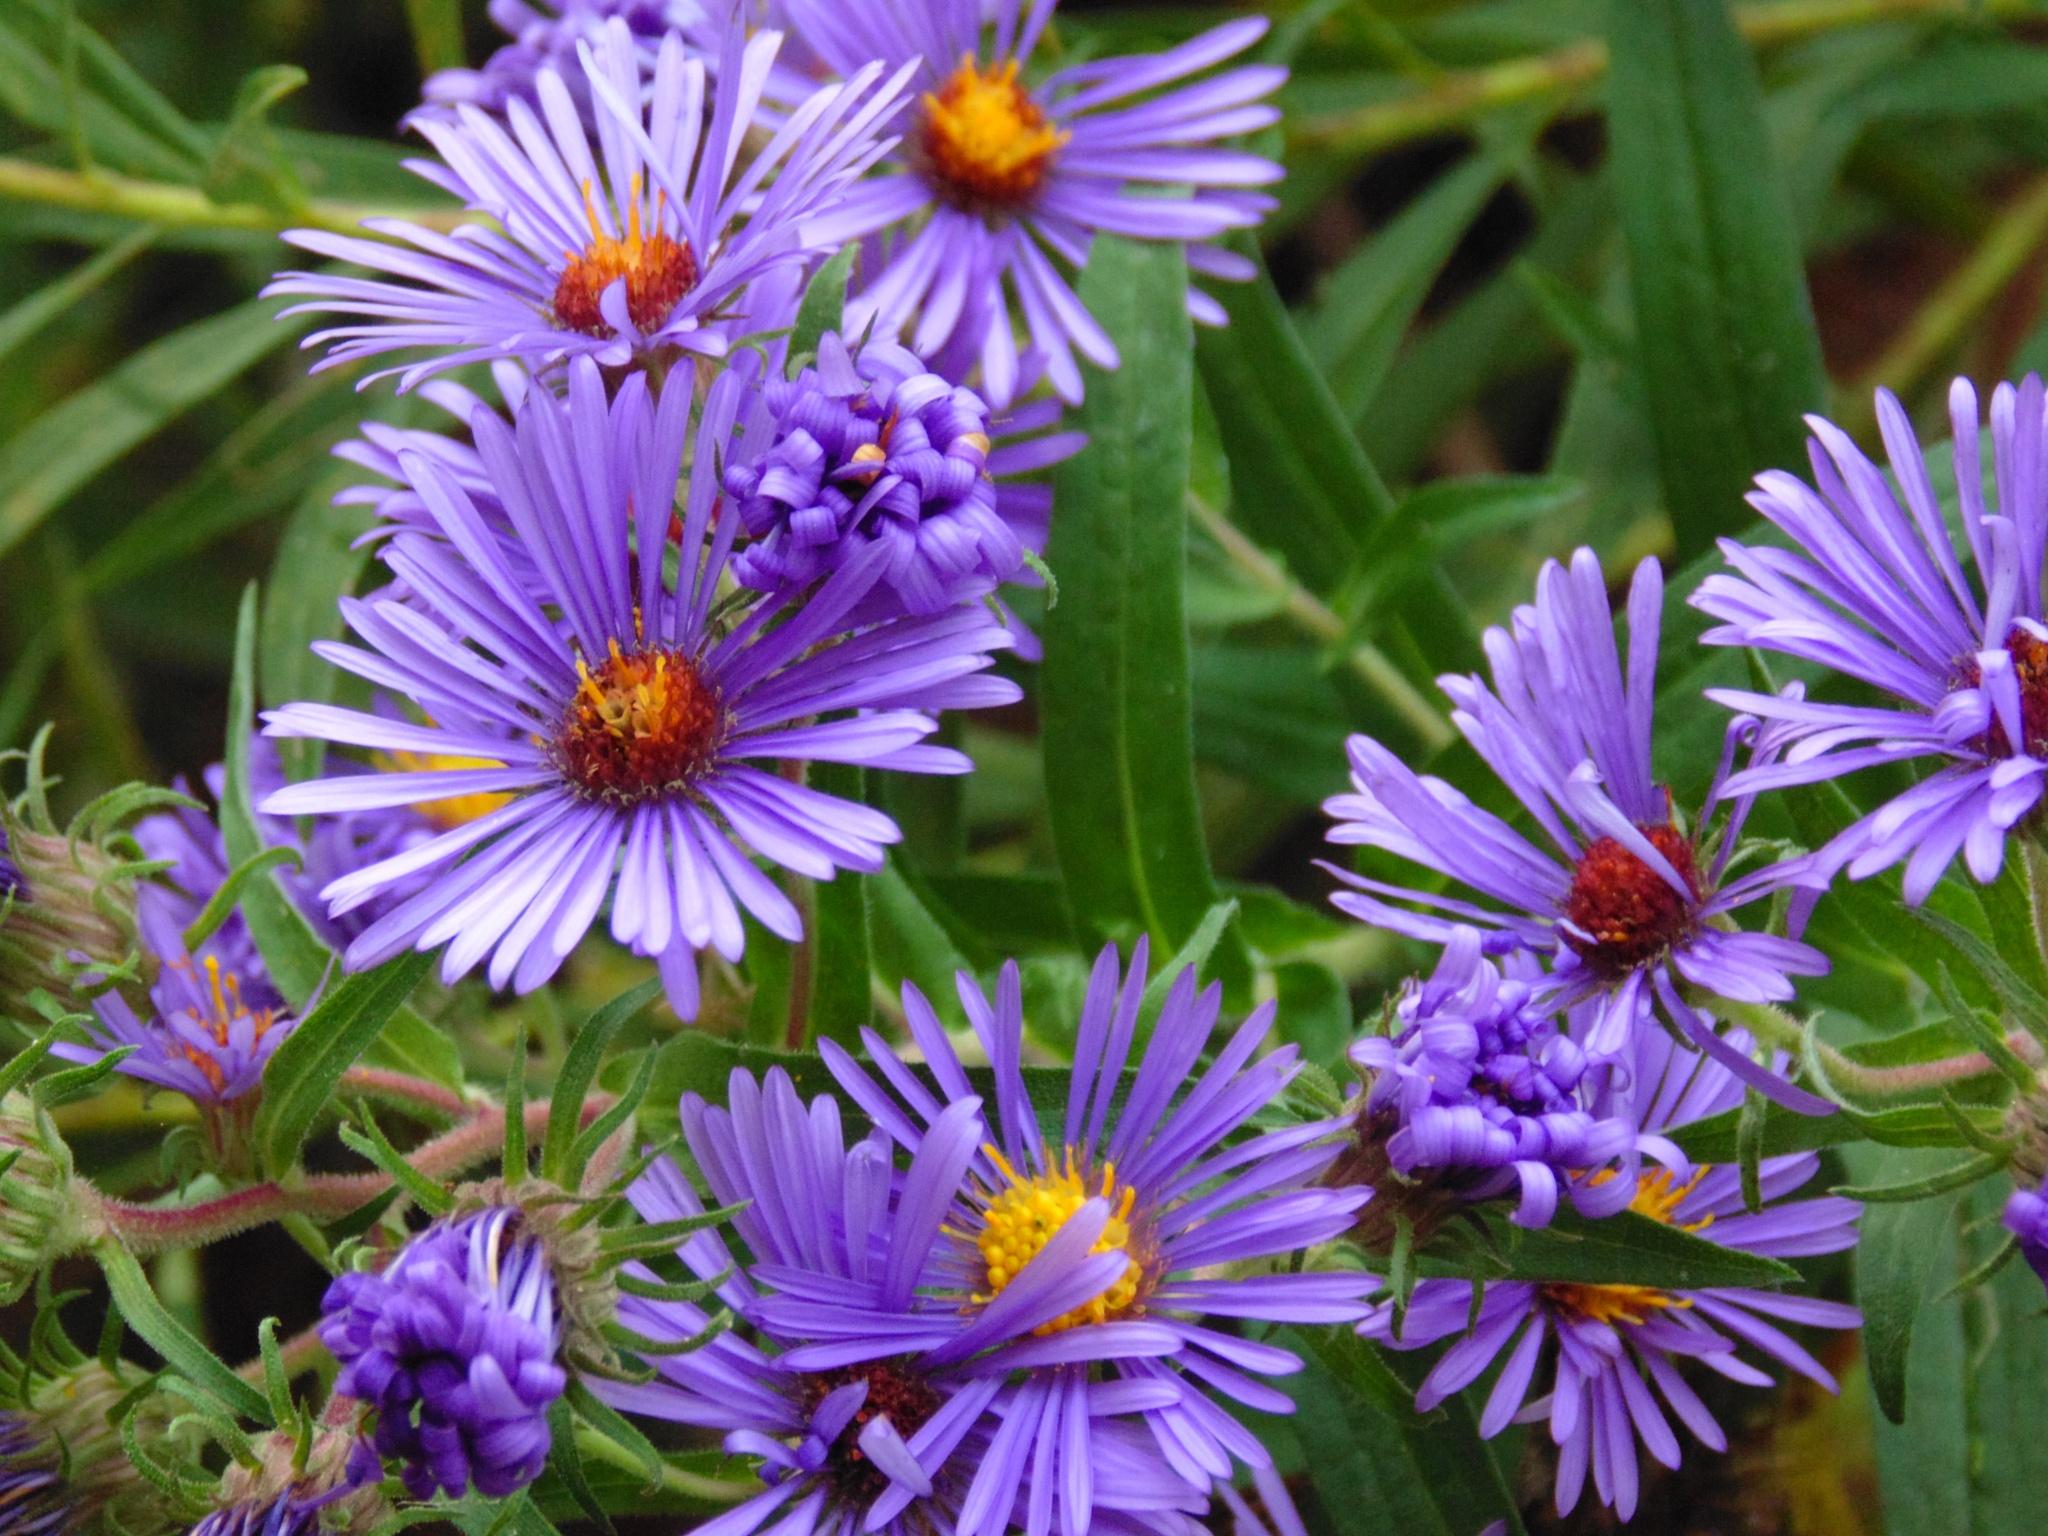 Purple wonder by tracy.halman